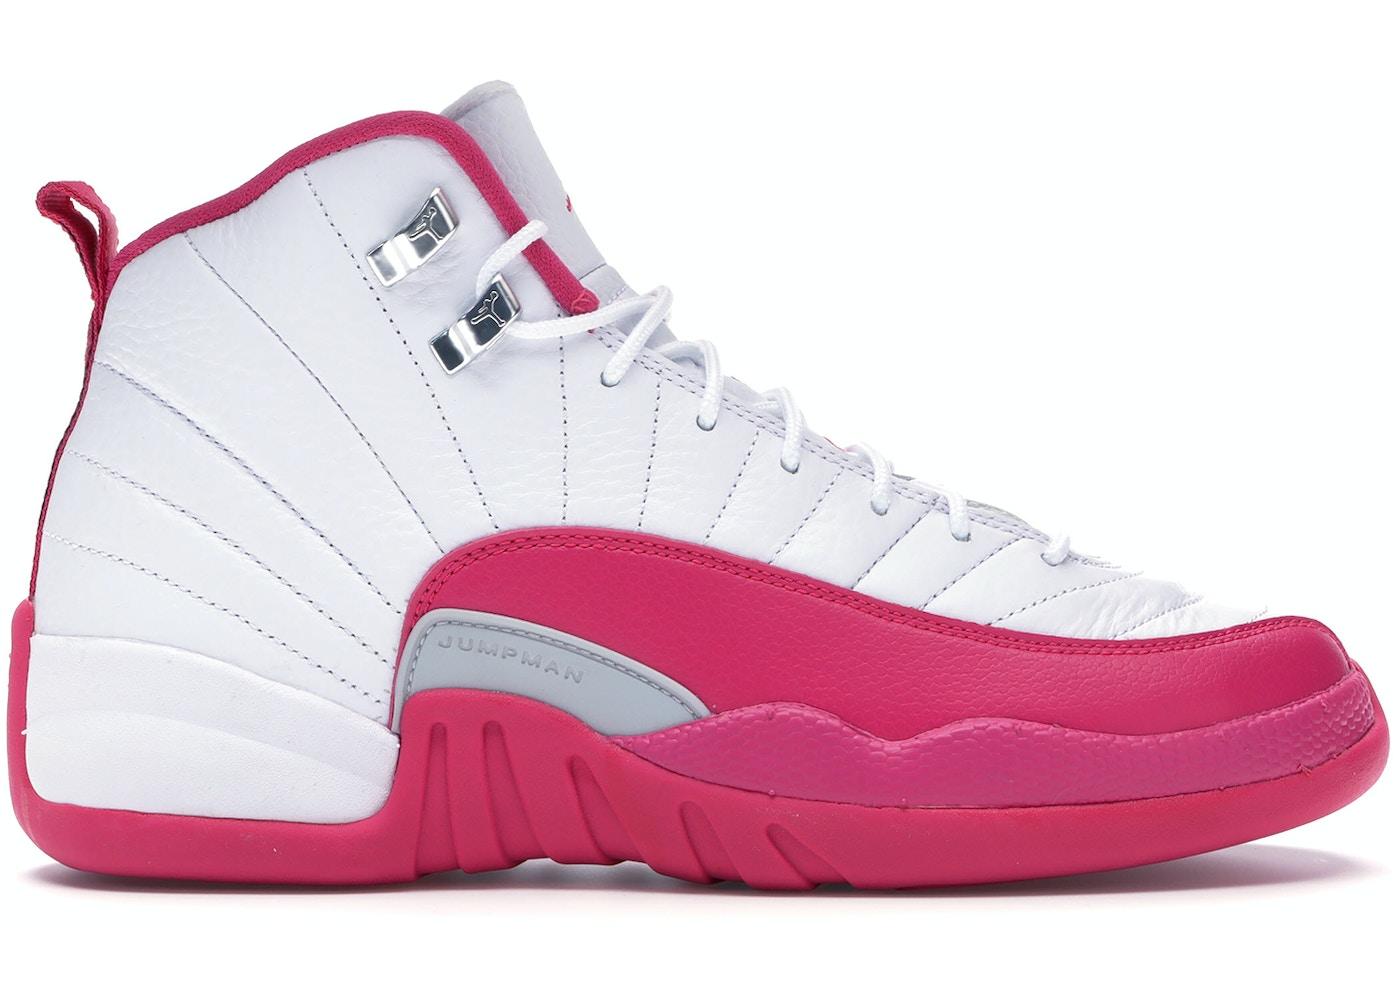 79596c257c6f Jordan 12 Retro Dynamic Pink (GS) - 510815-109